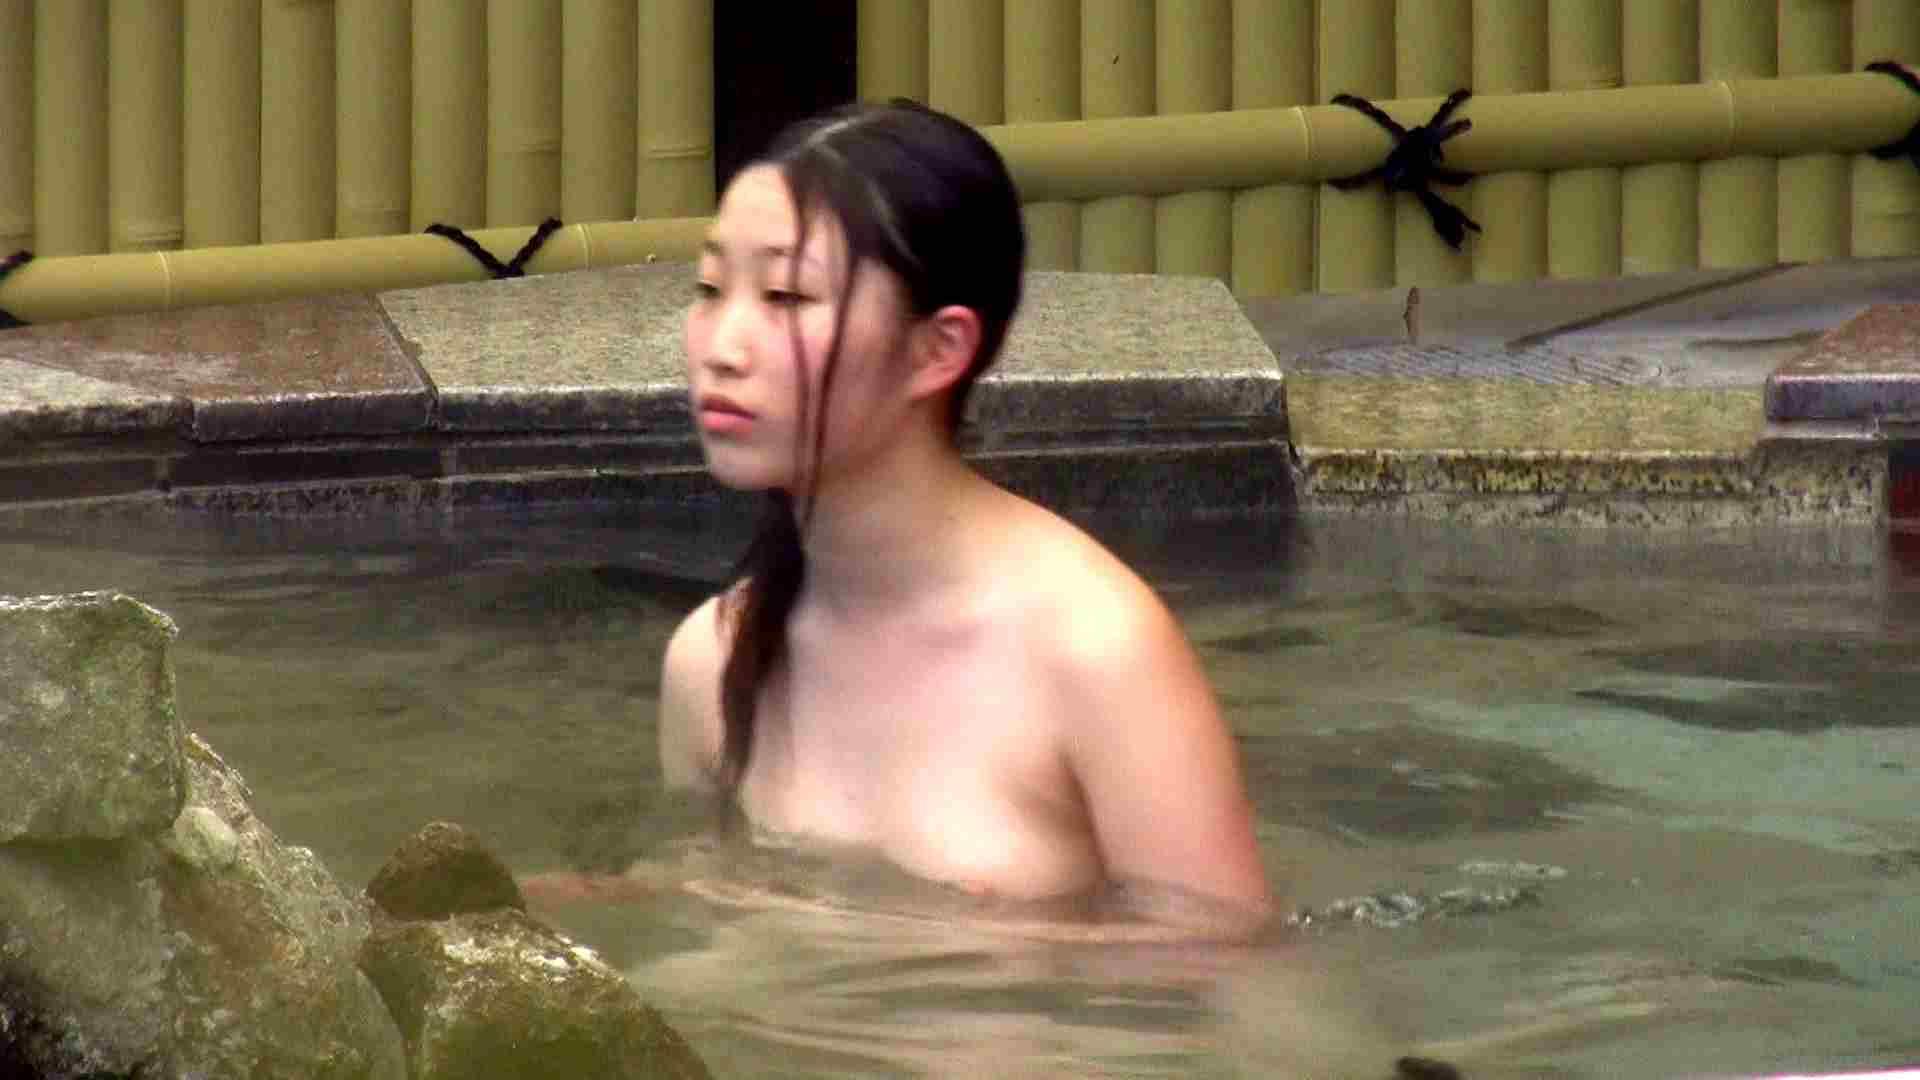 Aquaな露天風呂Vol.218 OLエロ画像 盗撮オマンコ無修正動画無料 81PICs 23